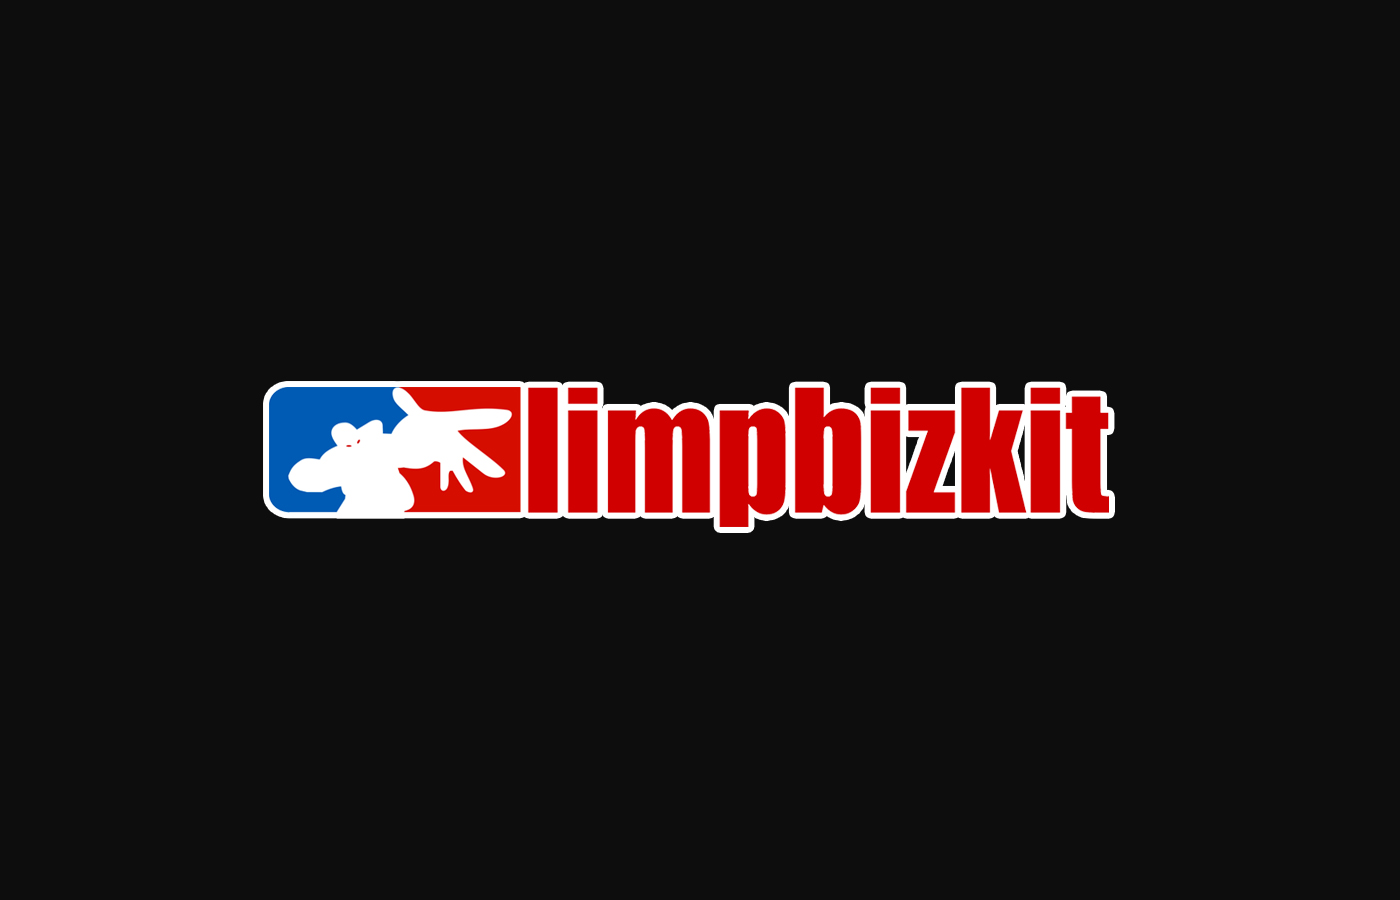 pic new posts wallpaper limp bizkit hd